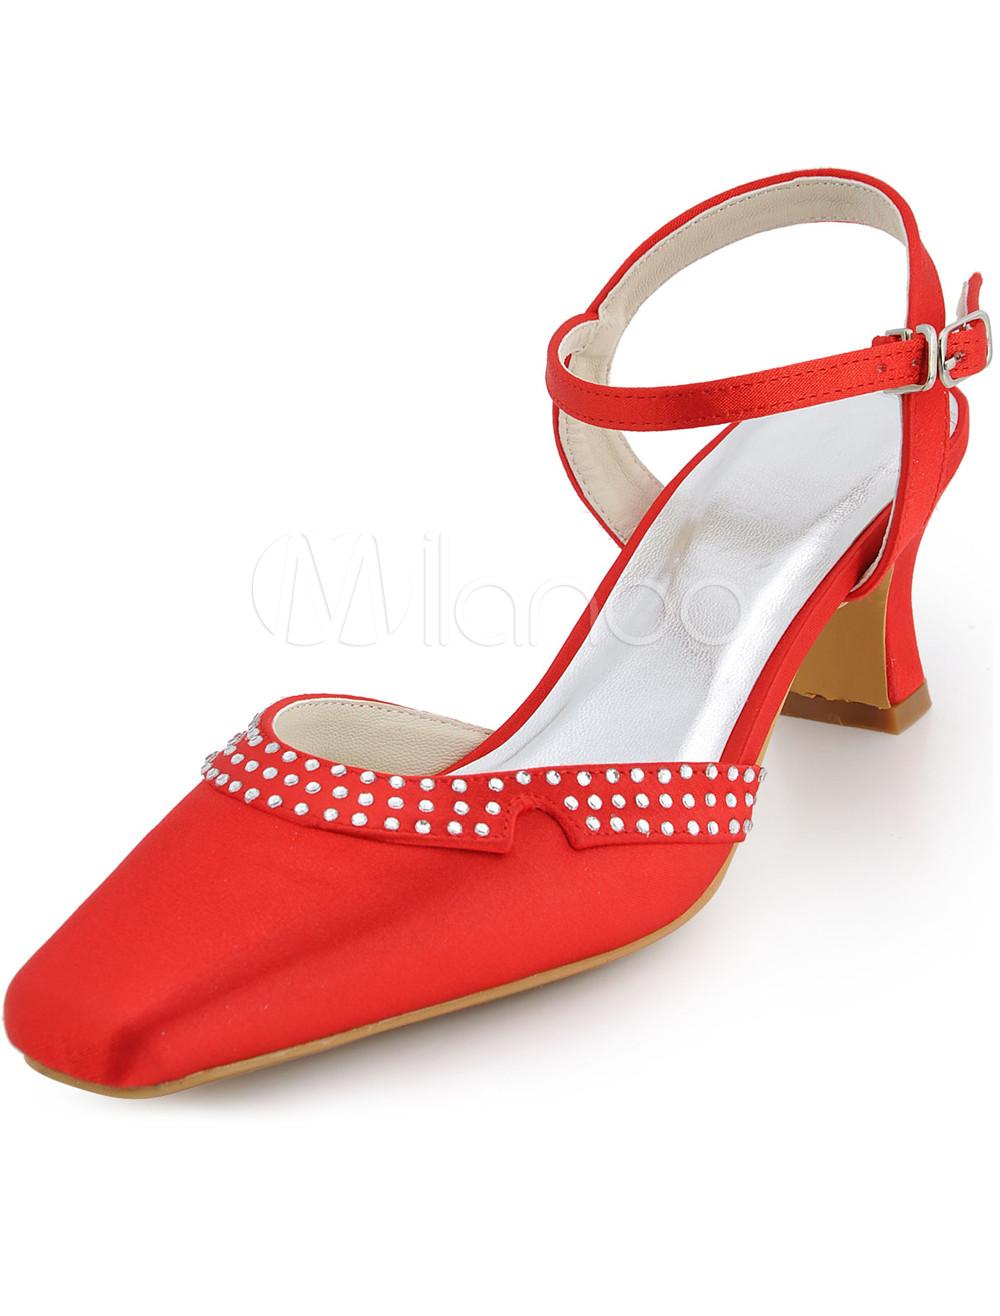 Vintage White Satin Low Heel Wedding Shoes